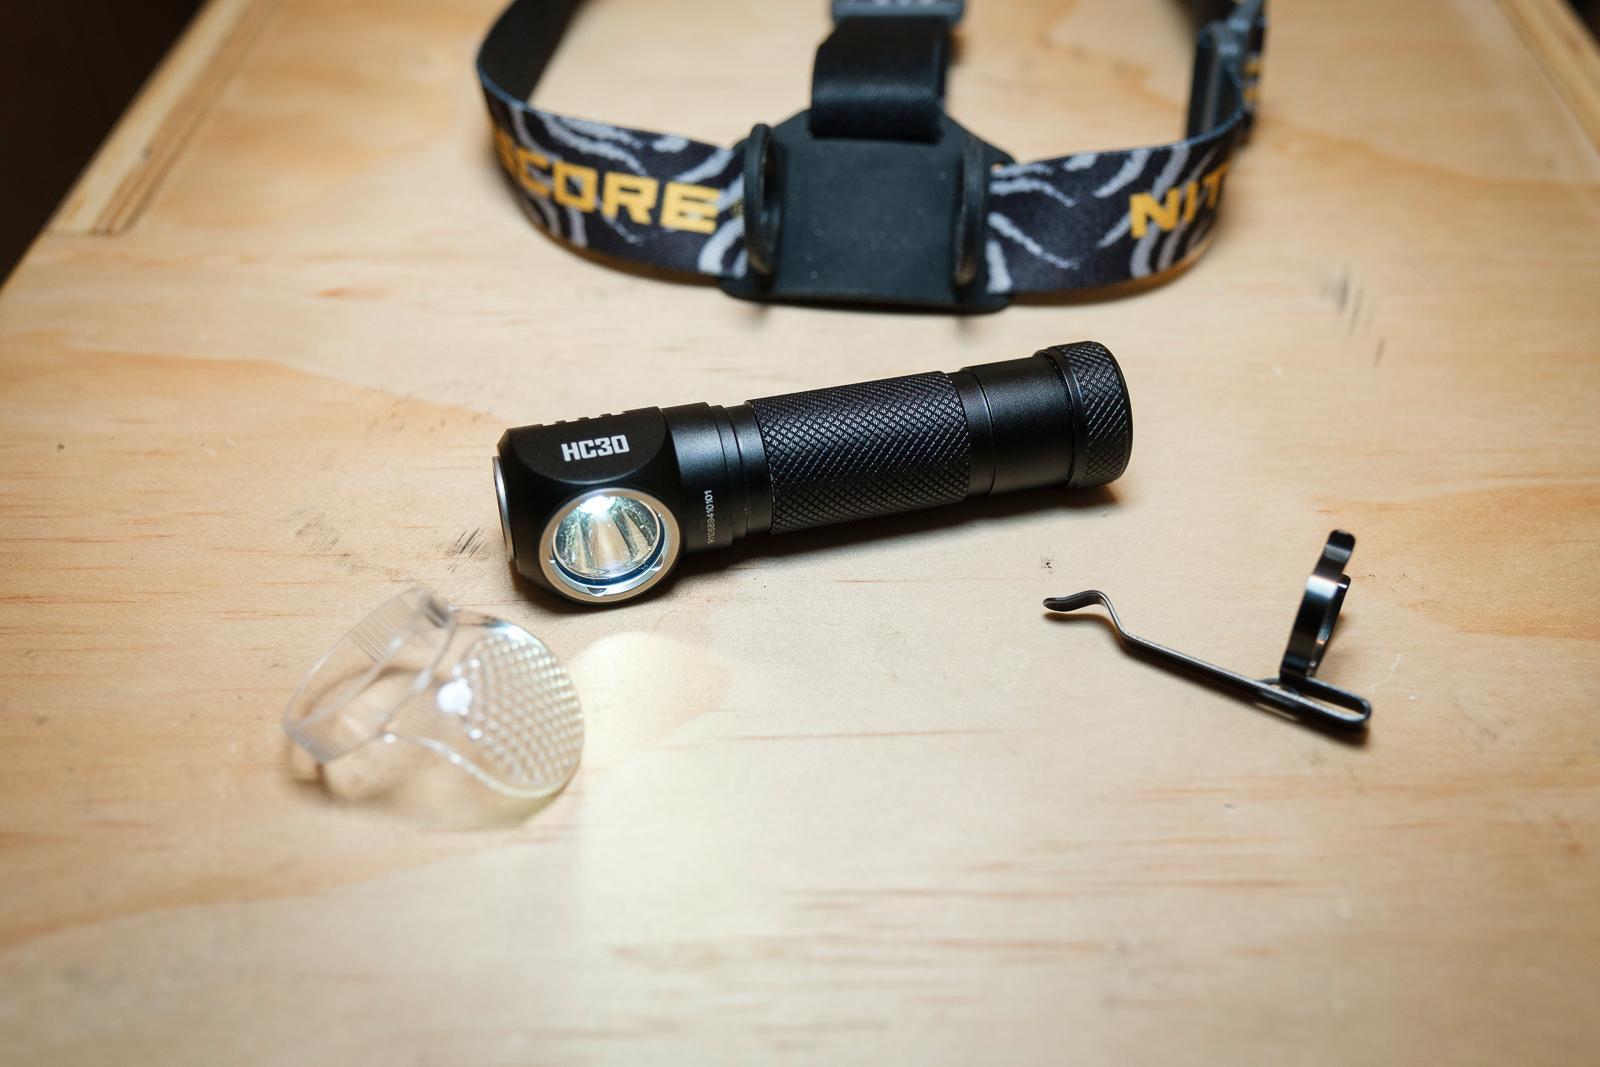 HC30 kommer med belteklips, lys-spreder og hodebånd